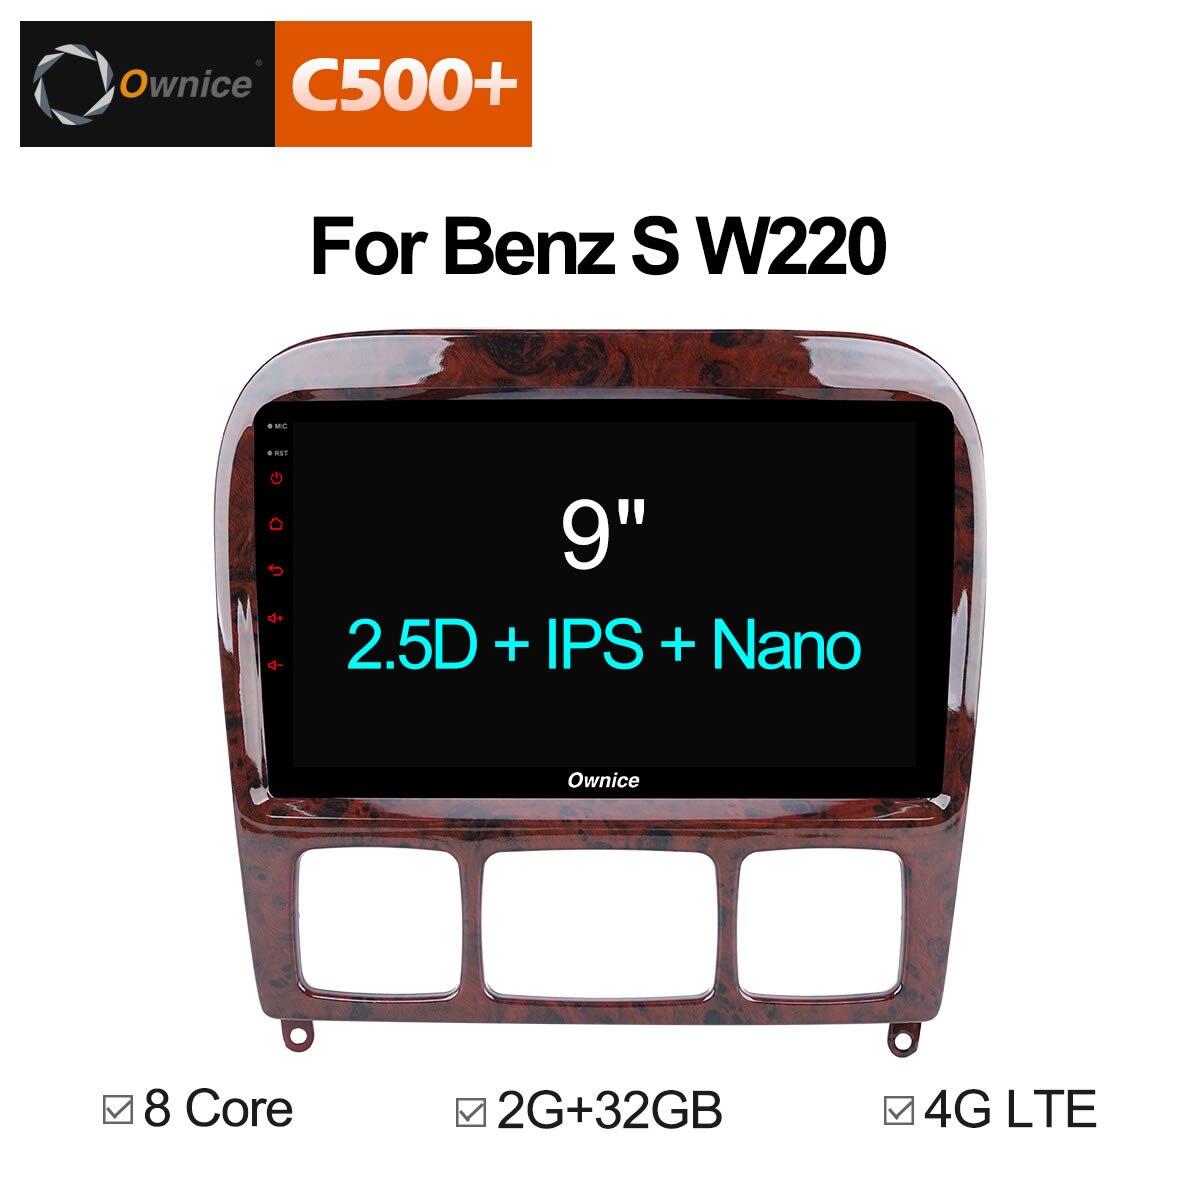 Ownice C500 + G10 Android 8,1 Автомобильный мультимедийный плеер dvd automotivo радио gps 2 din для Mercedes Benz/S320/S350/W220/W215/CL600 4G